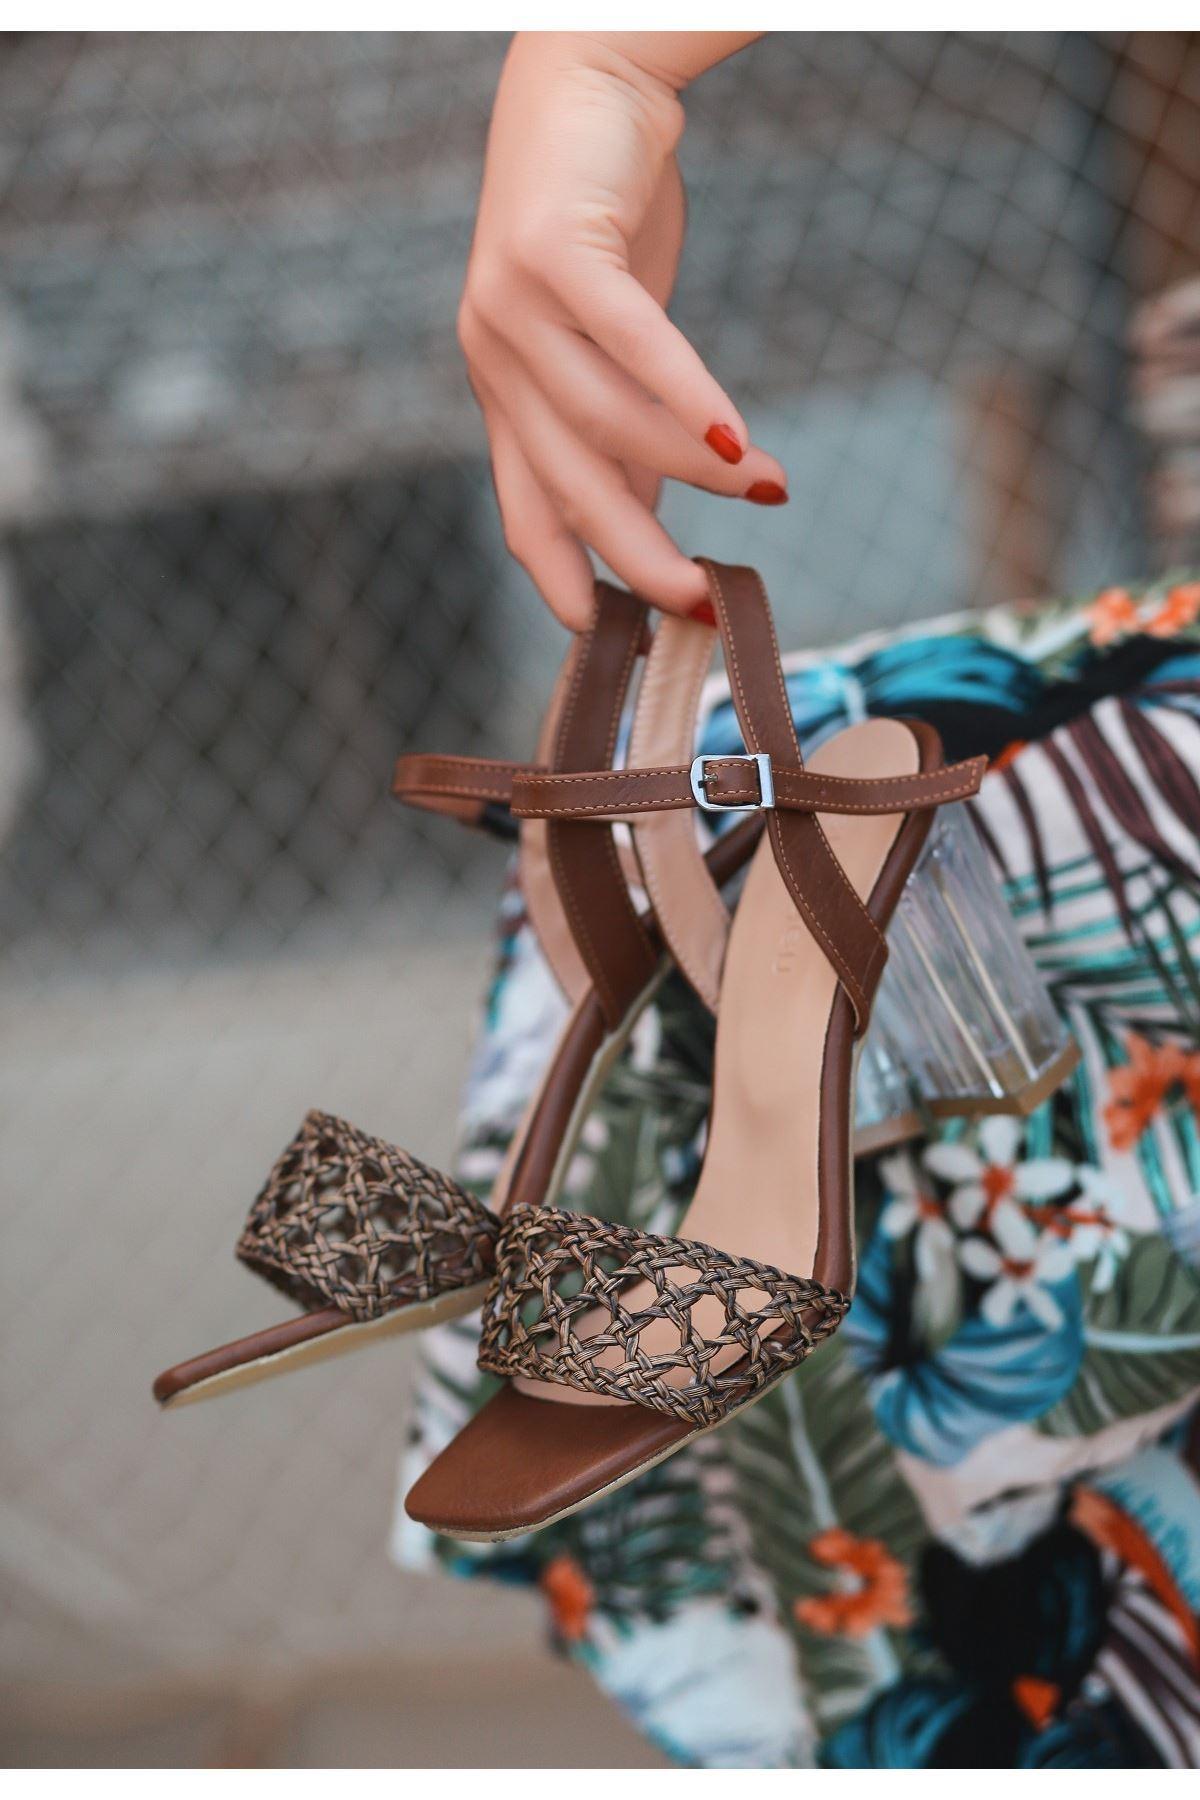 Lory Kahverengi Cilt Örgülü Topuklu Ayakkabı